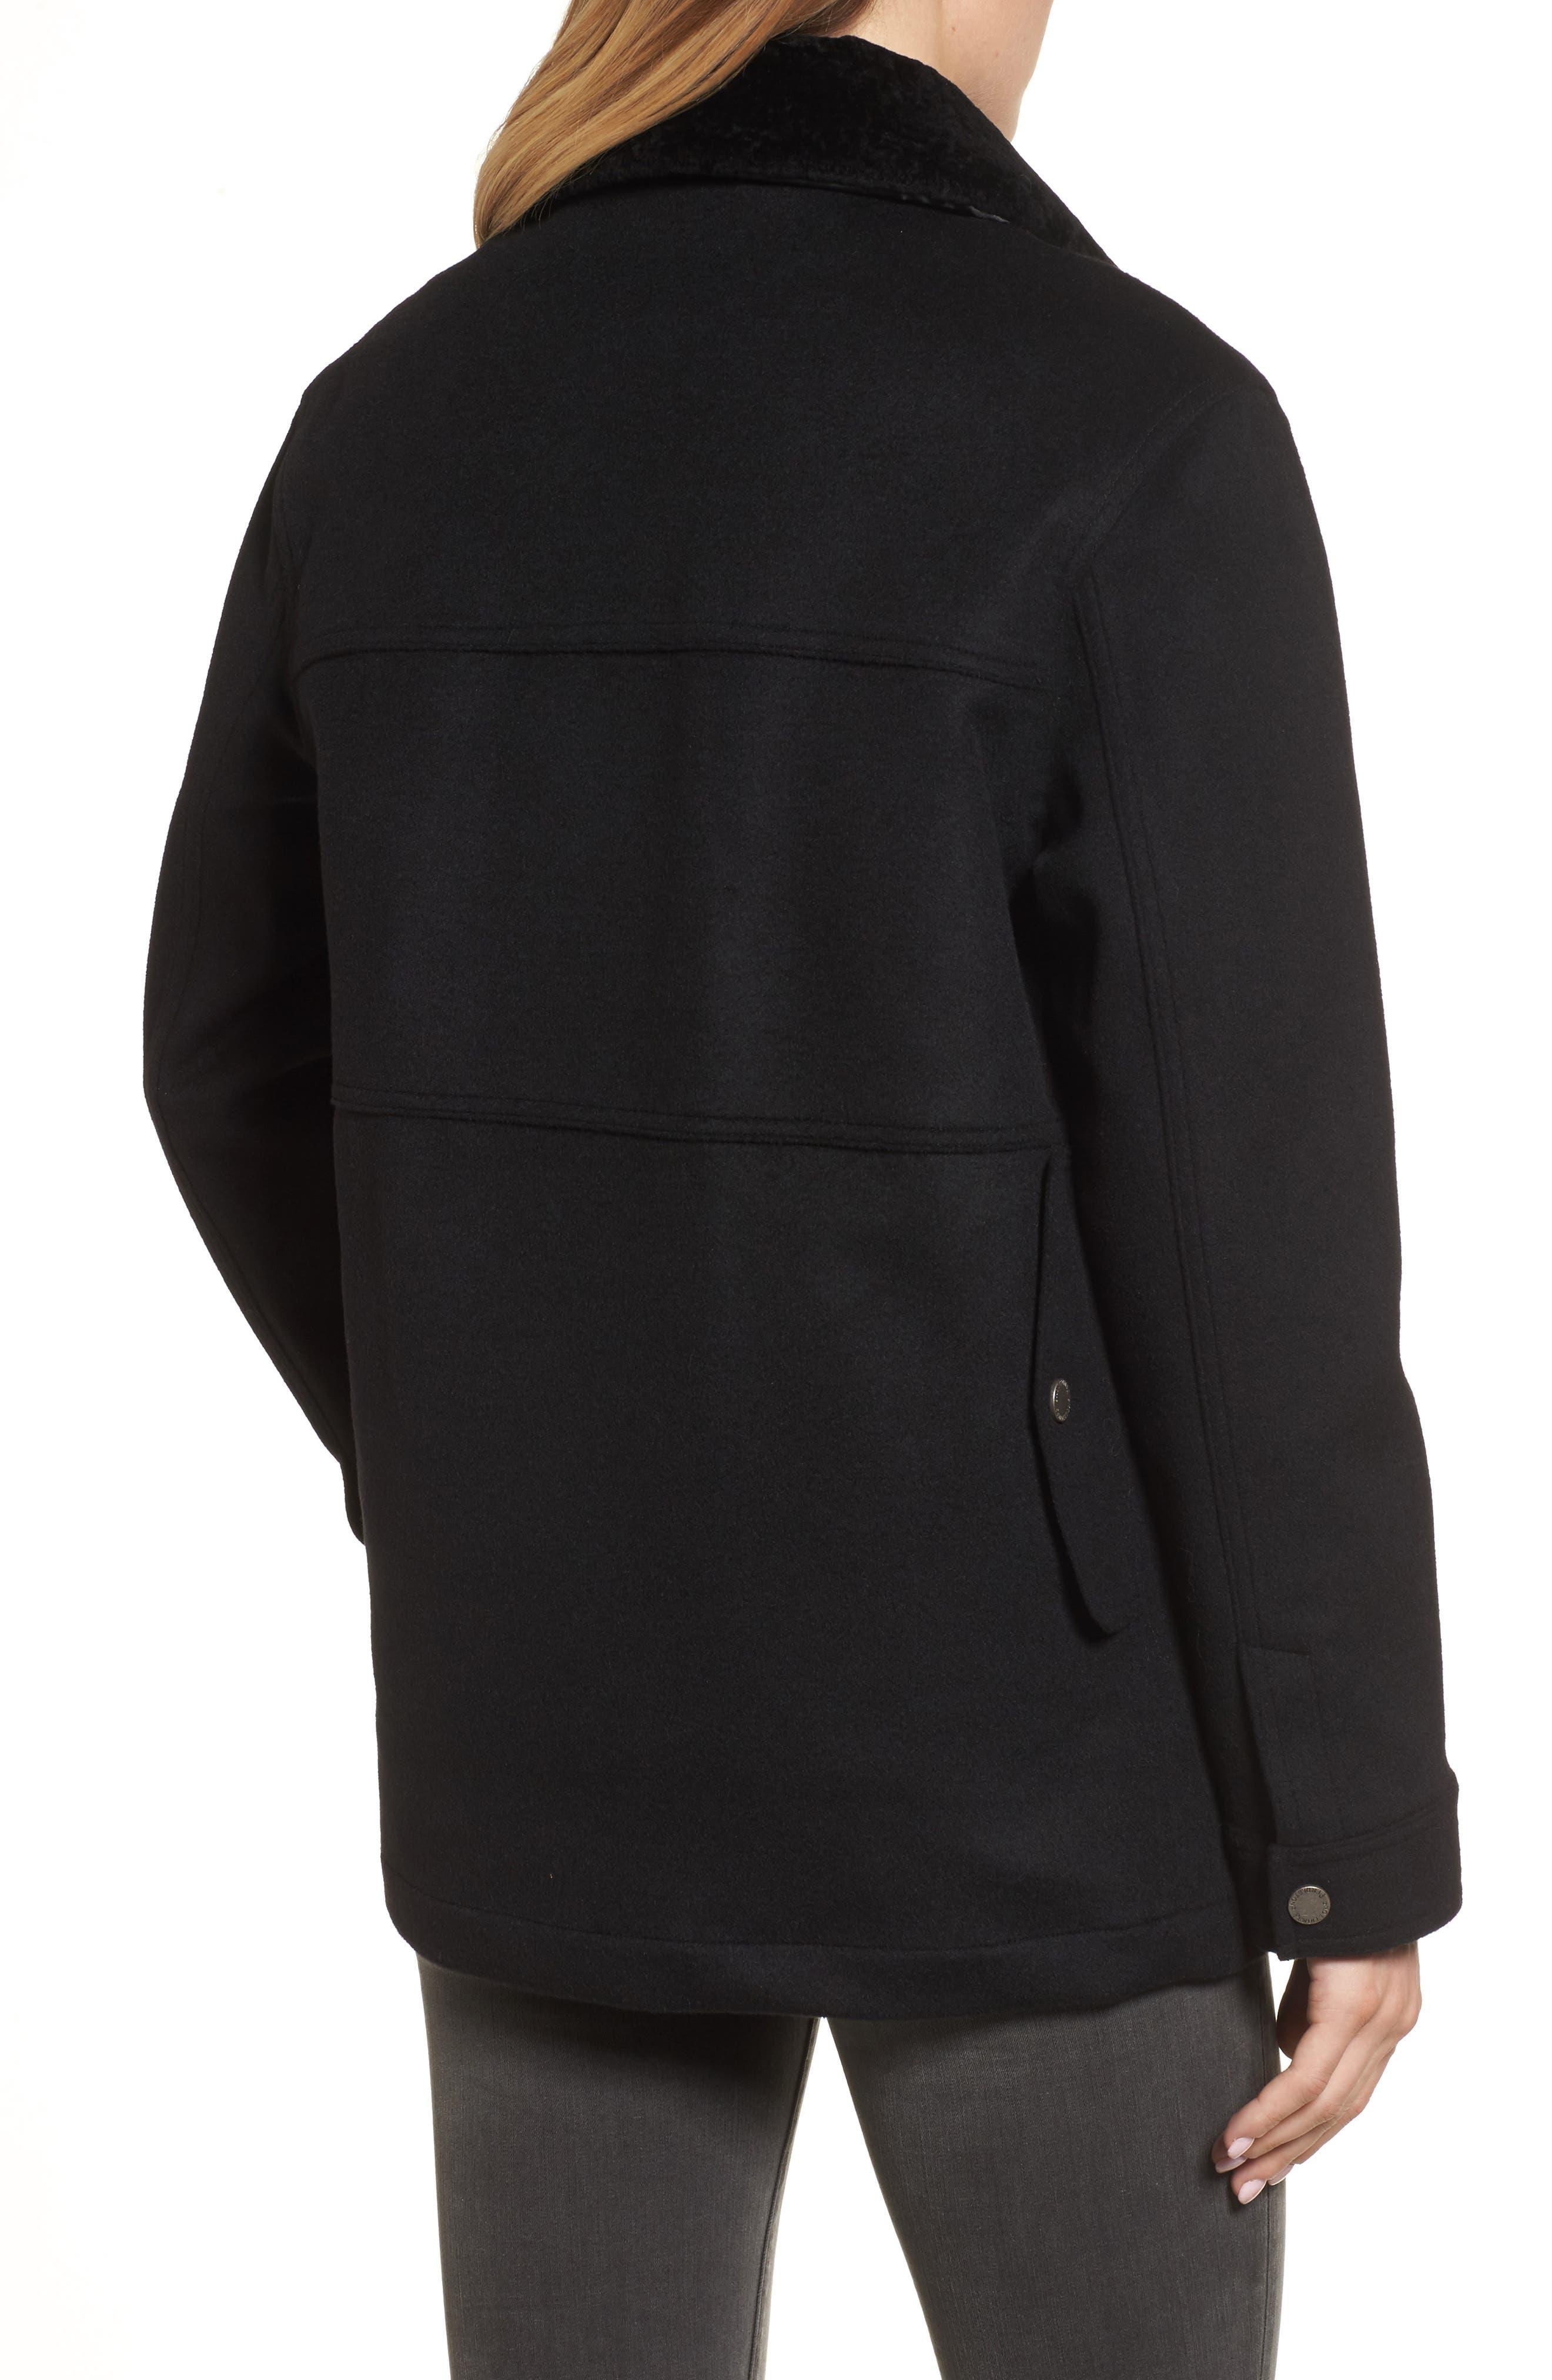 Manchester Waterproof Field Coat,                             Alternate thumbnail 2, color,                             Black